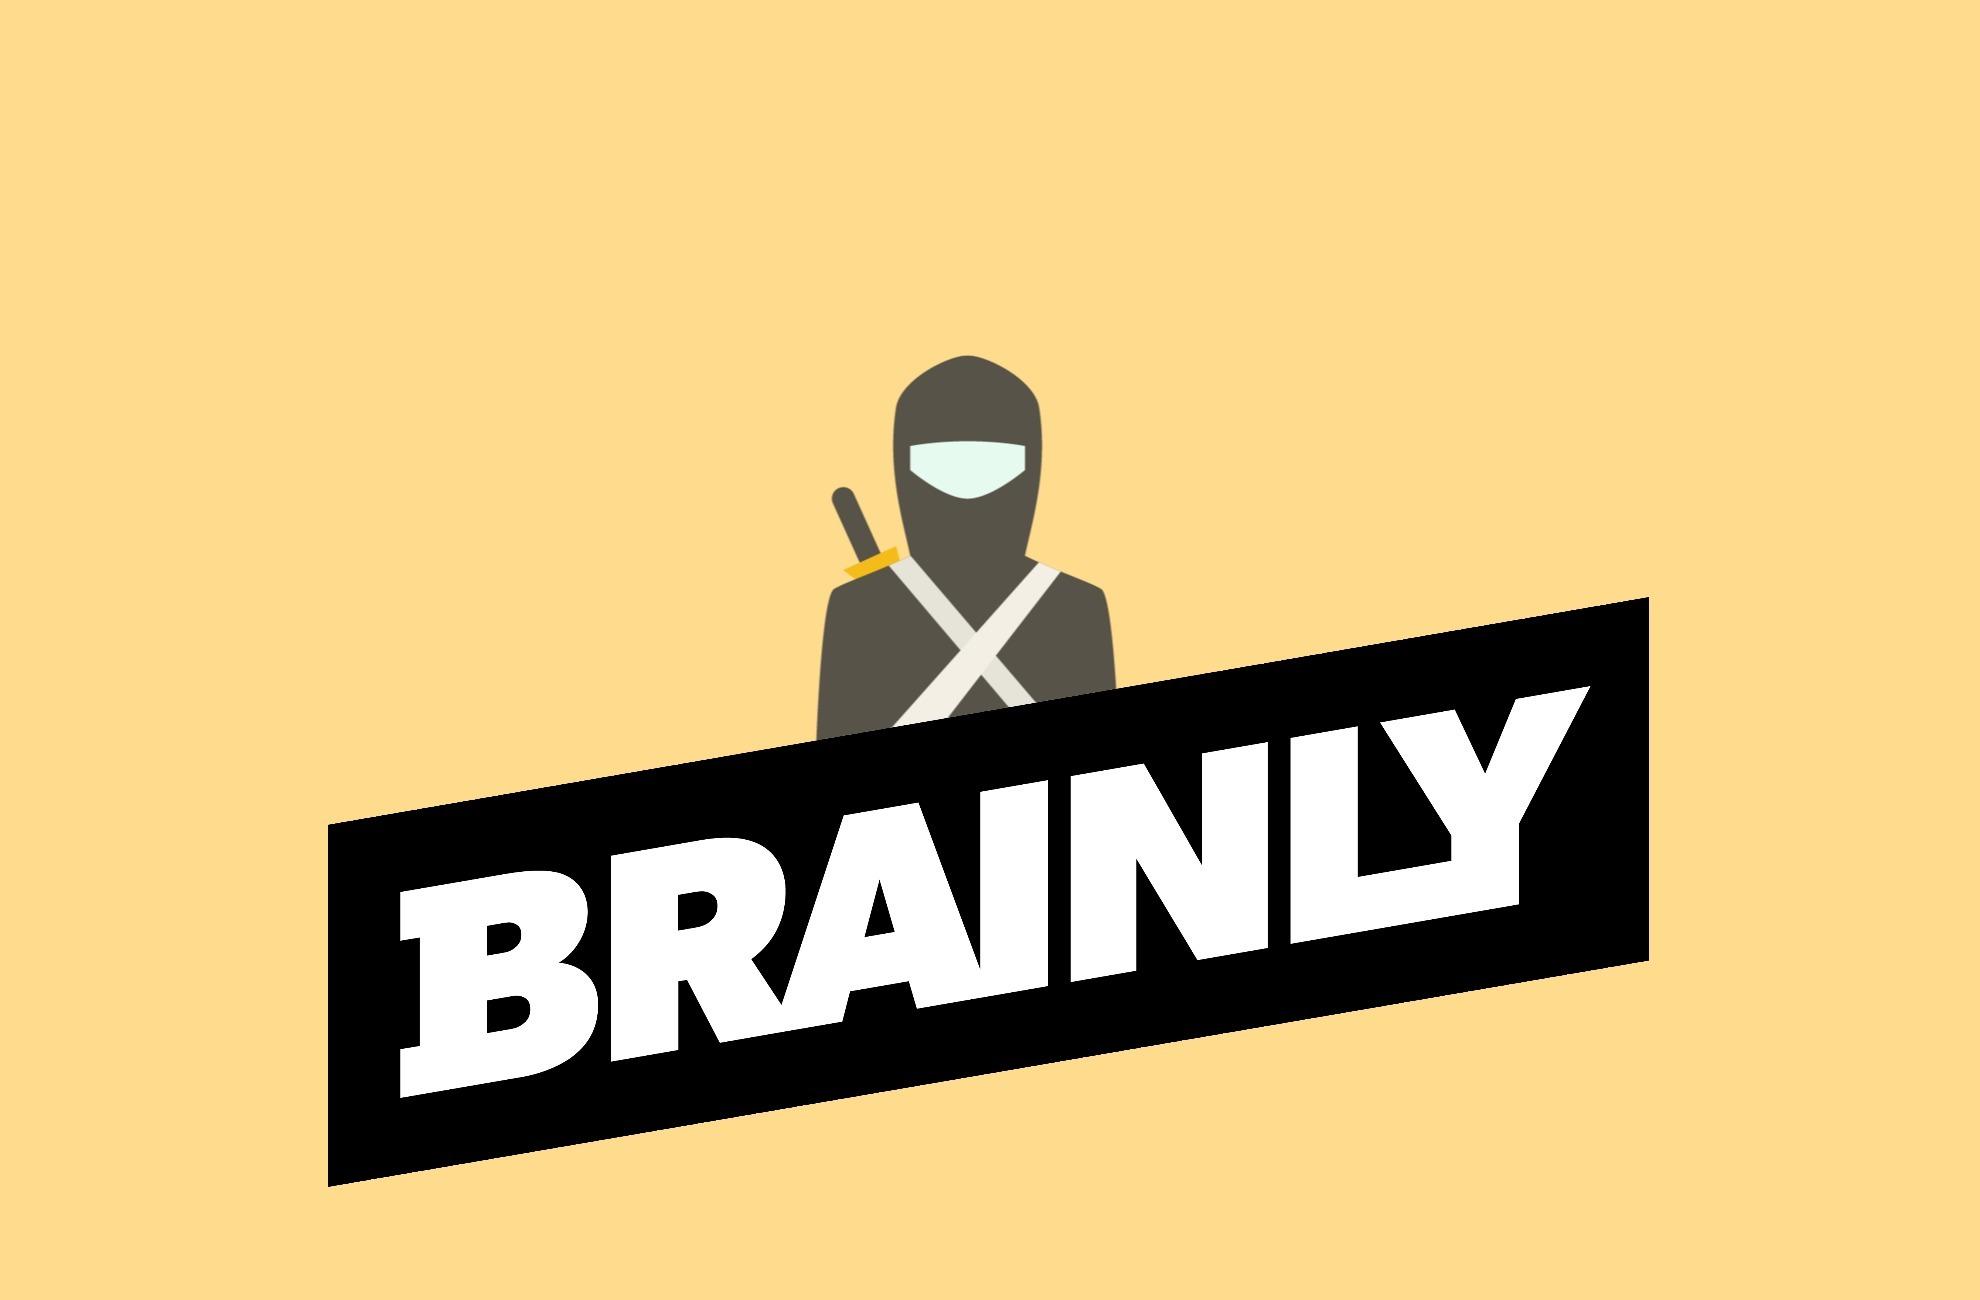 Siapa Penemu Sepak Takraw Yang Pertama Kali Brainly Co Id